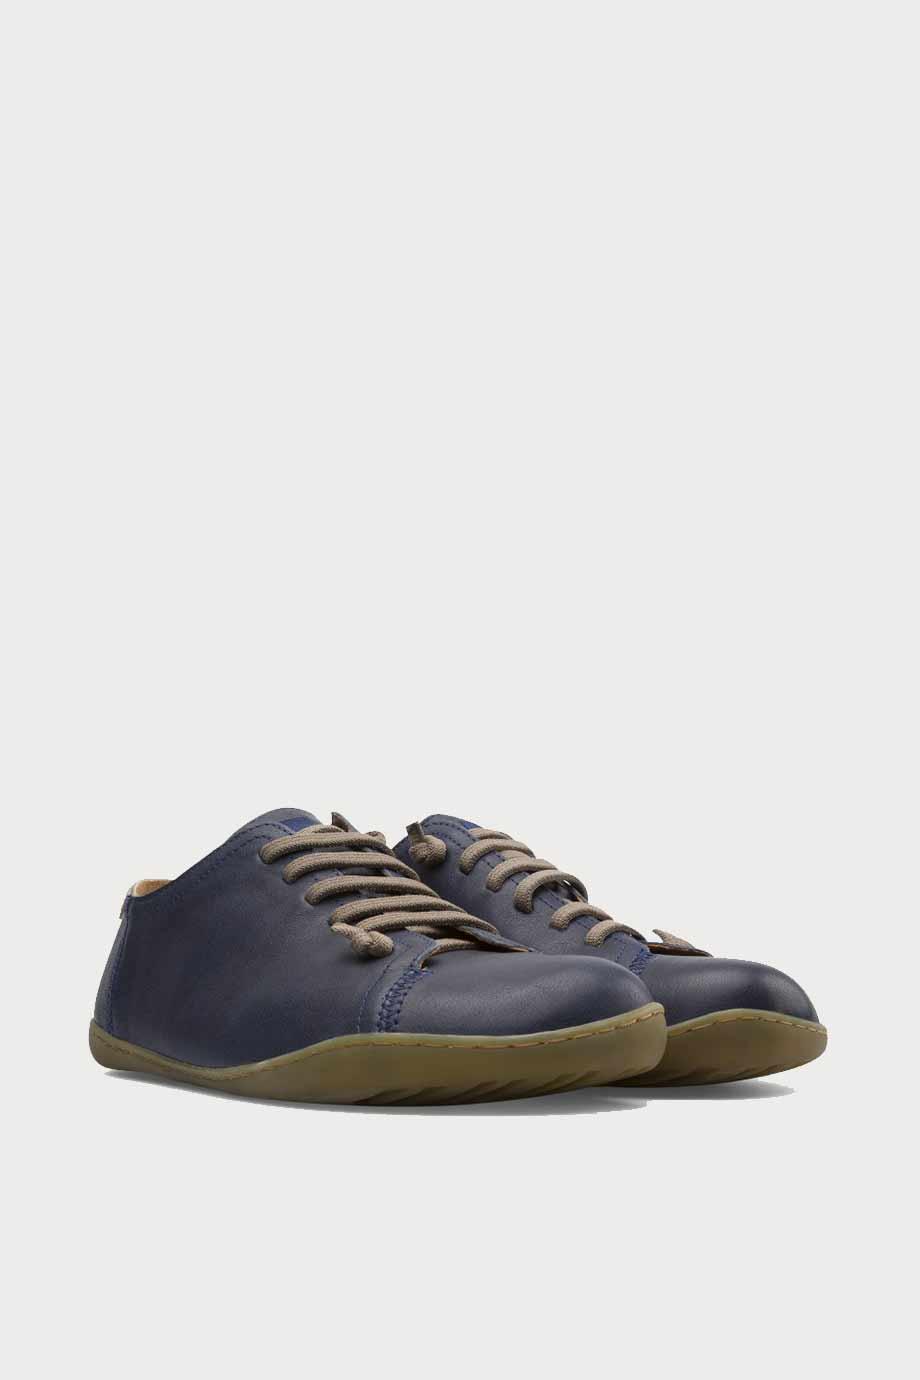 spiridoula metheniti shoes xalkida p Camper 17665 229 Peu Cami blue 2